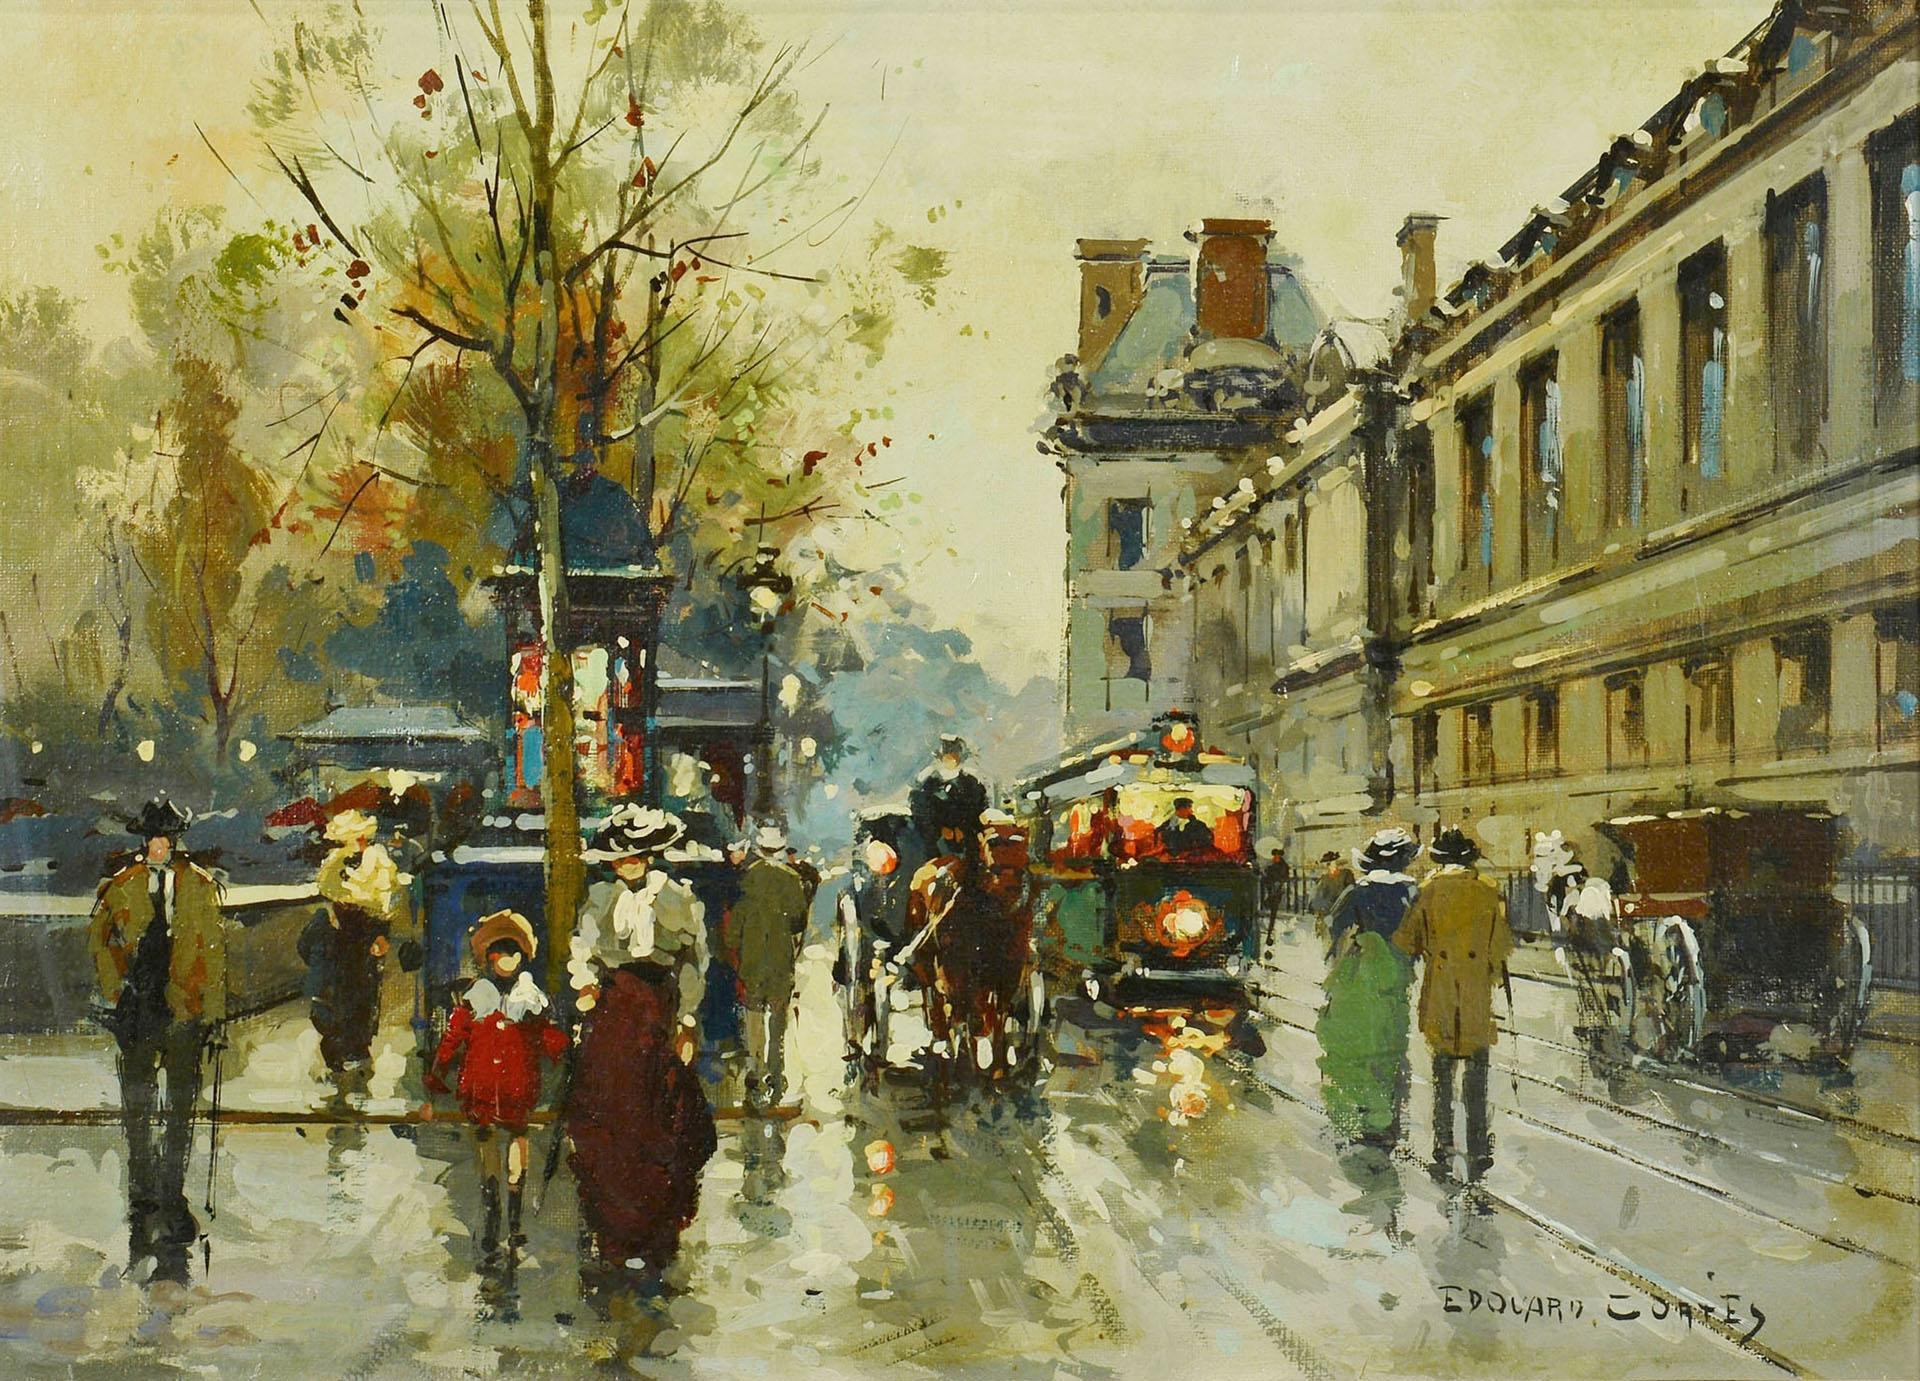 Edouard Cortes, Oil on Canvas Paris Street Scene